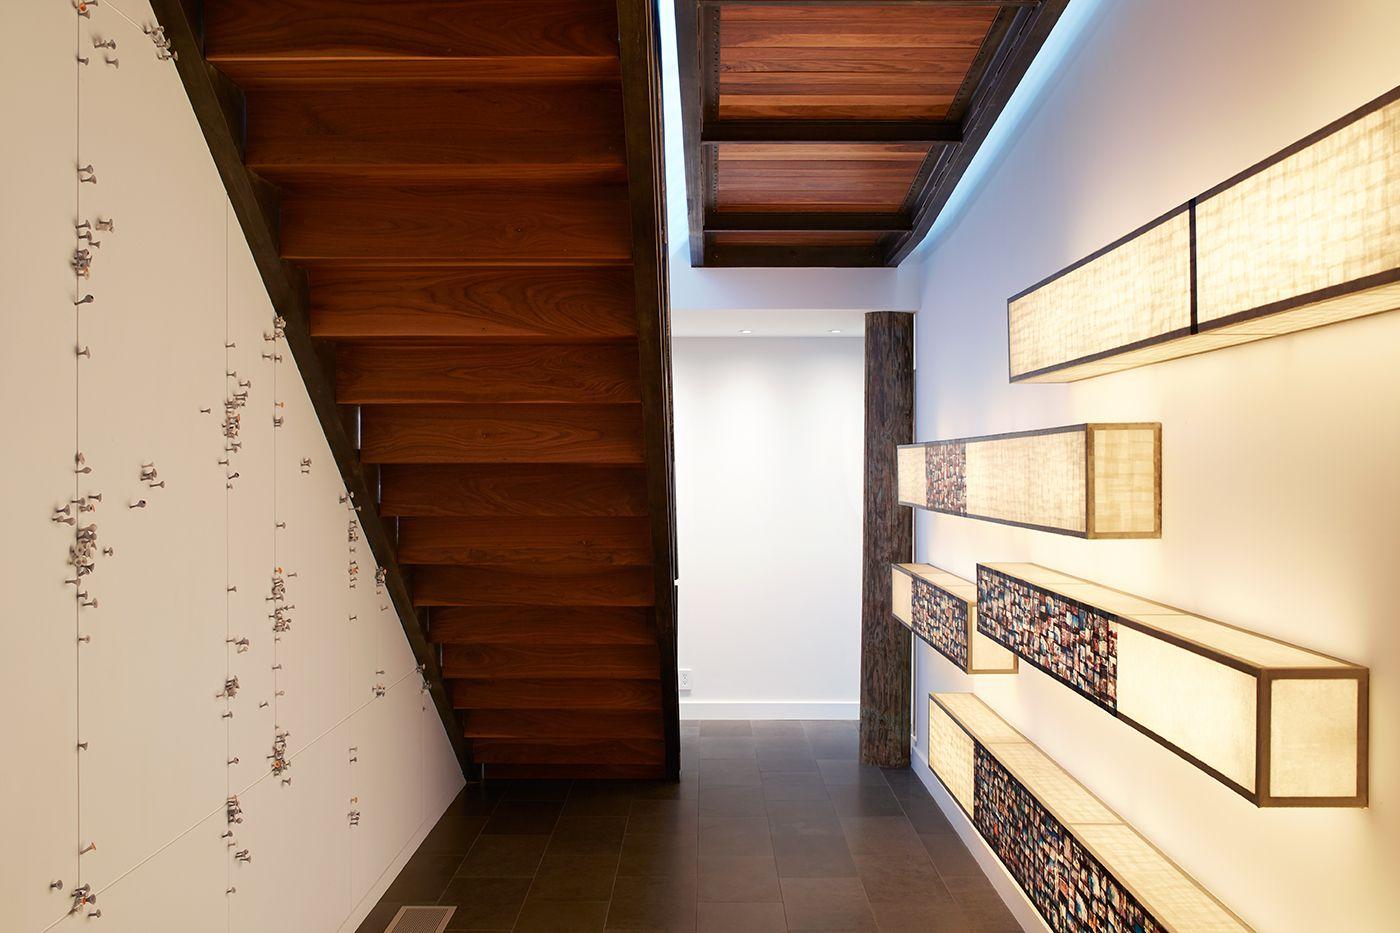 Location/ Palo Alto, California Architect/ Robert Khan